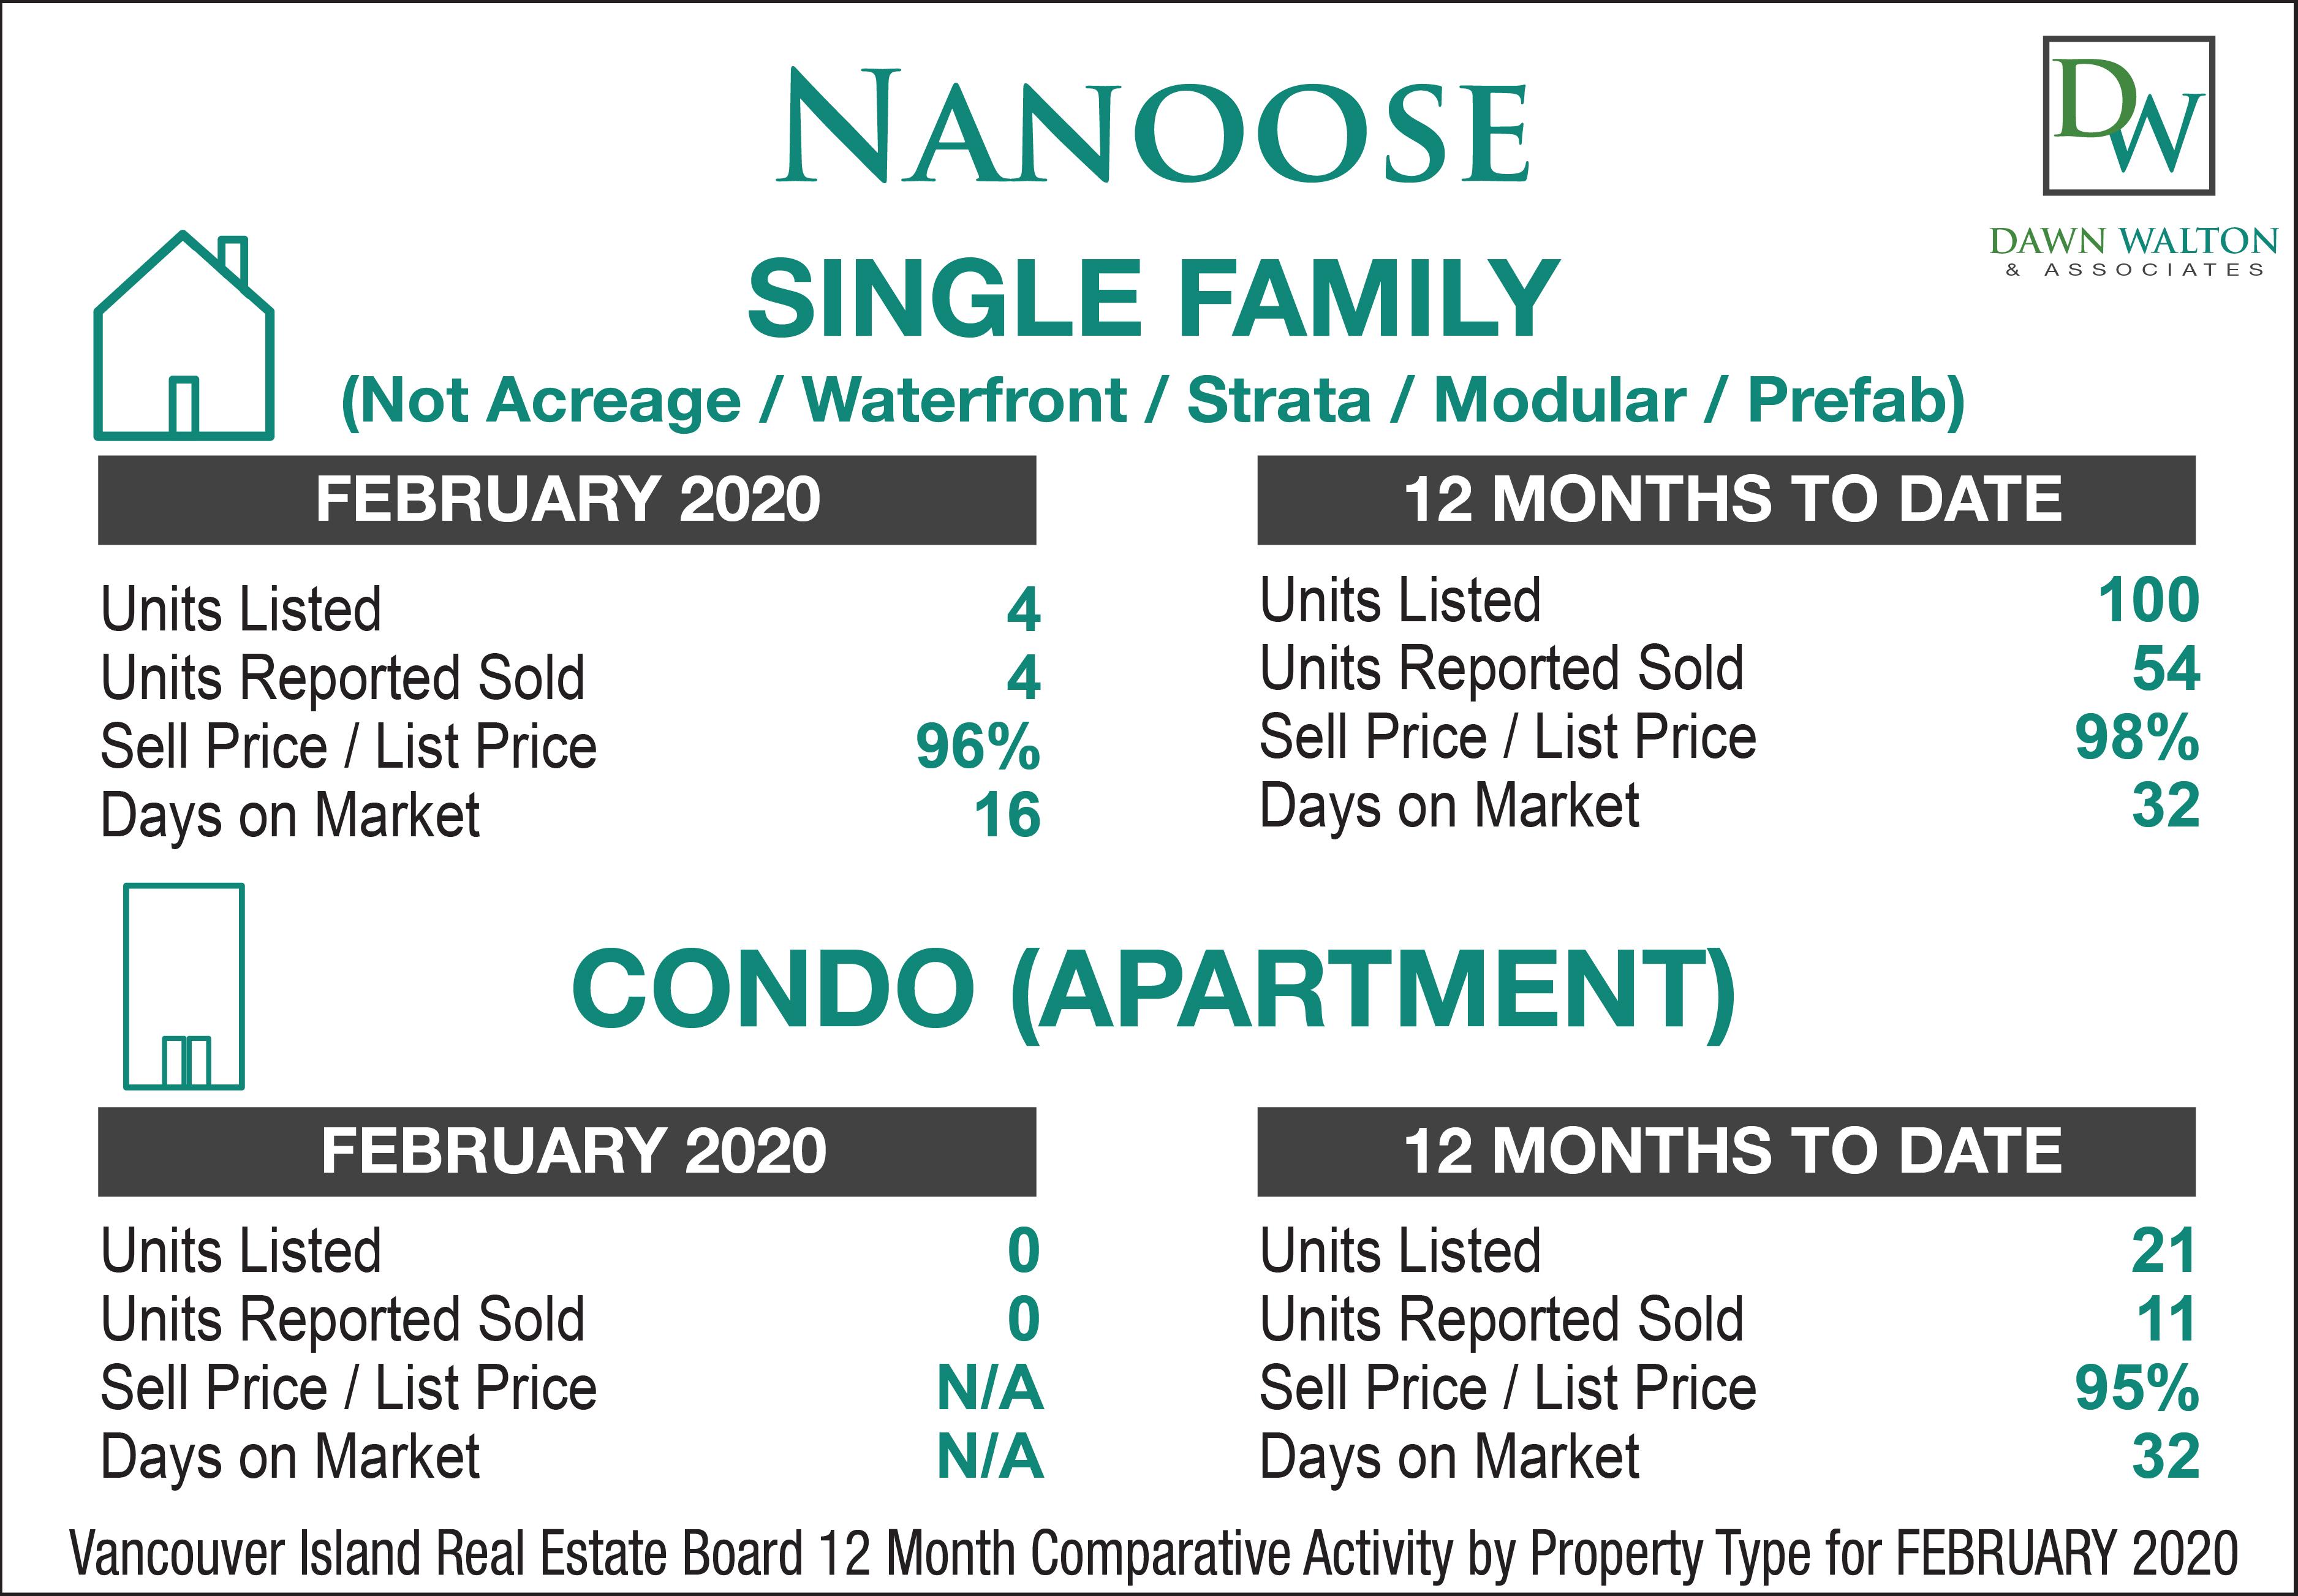 Nanoose Real Estate Market Stats February 2020 - Nanaimo Realtor Dawn Walton